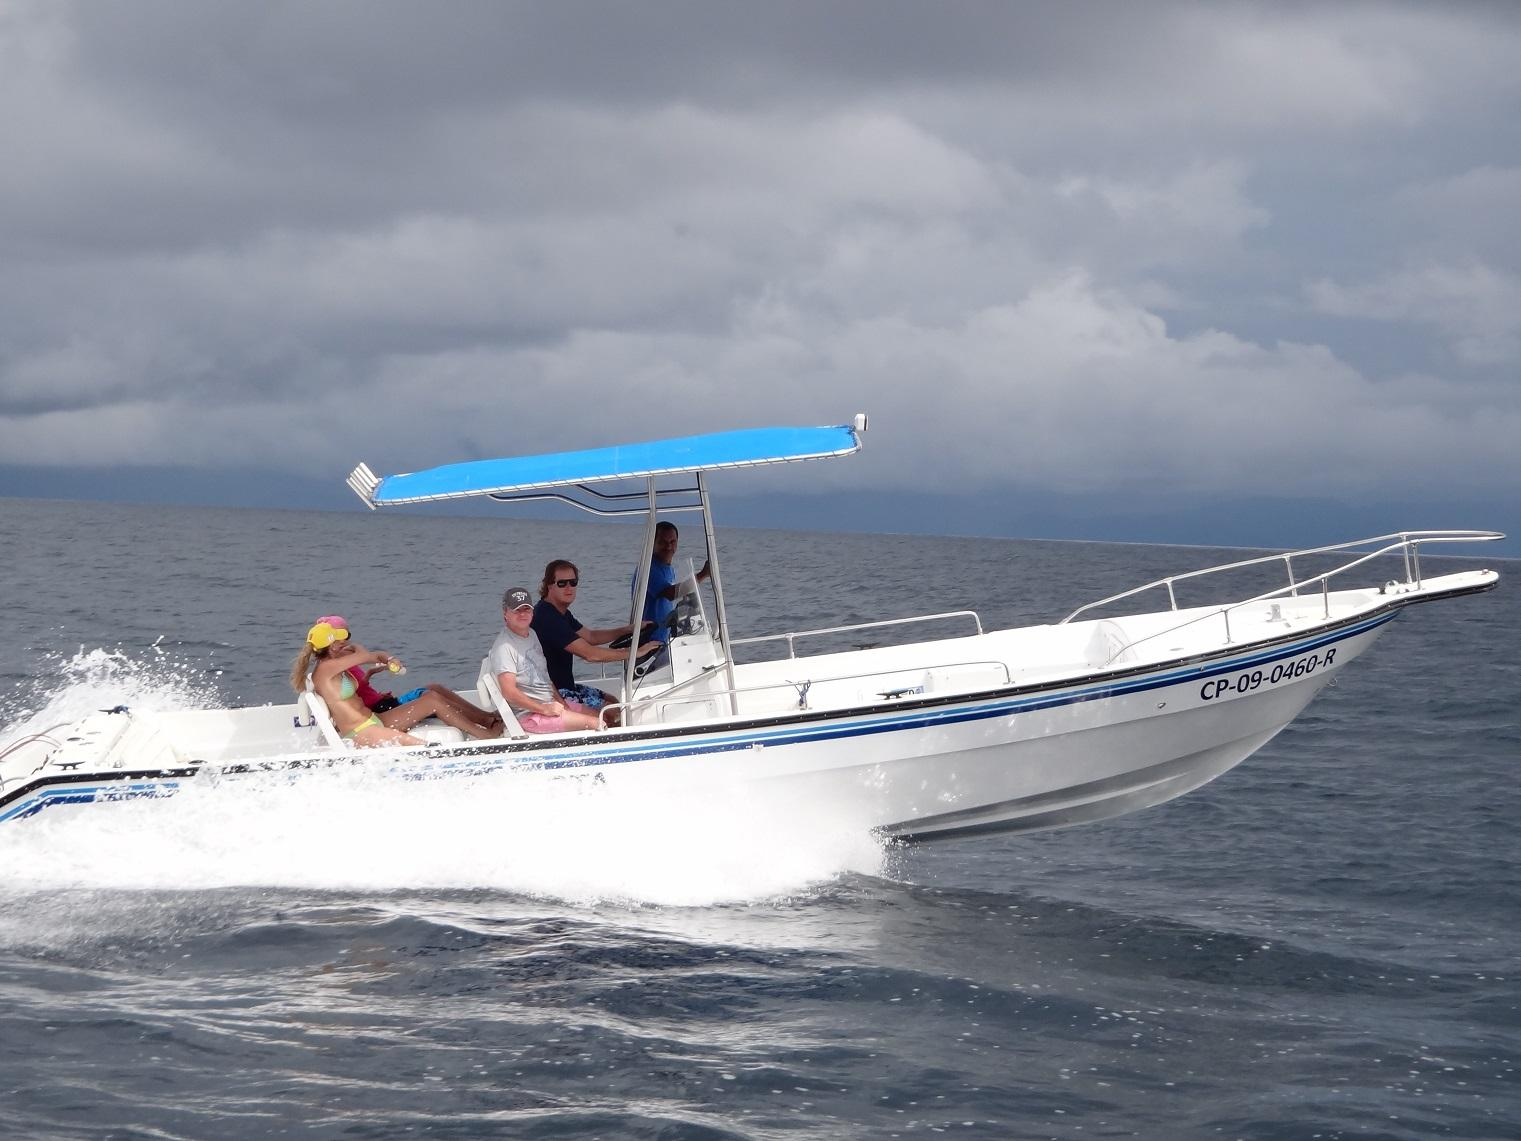 ColombiaBDbarco98m.1.JPG